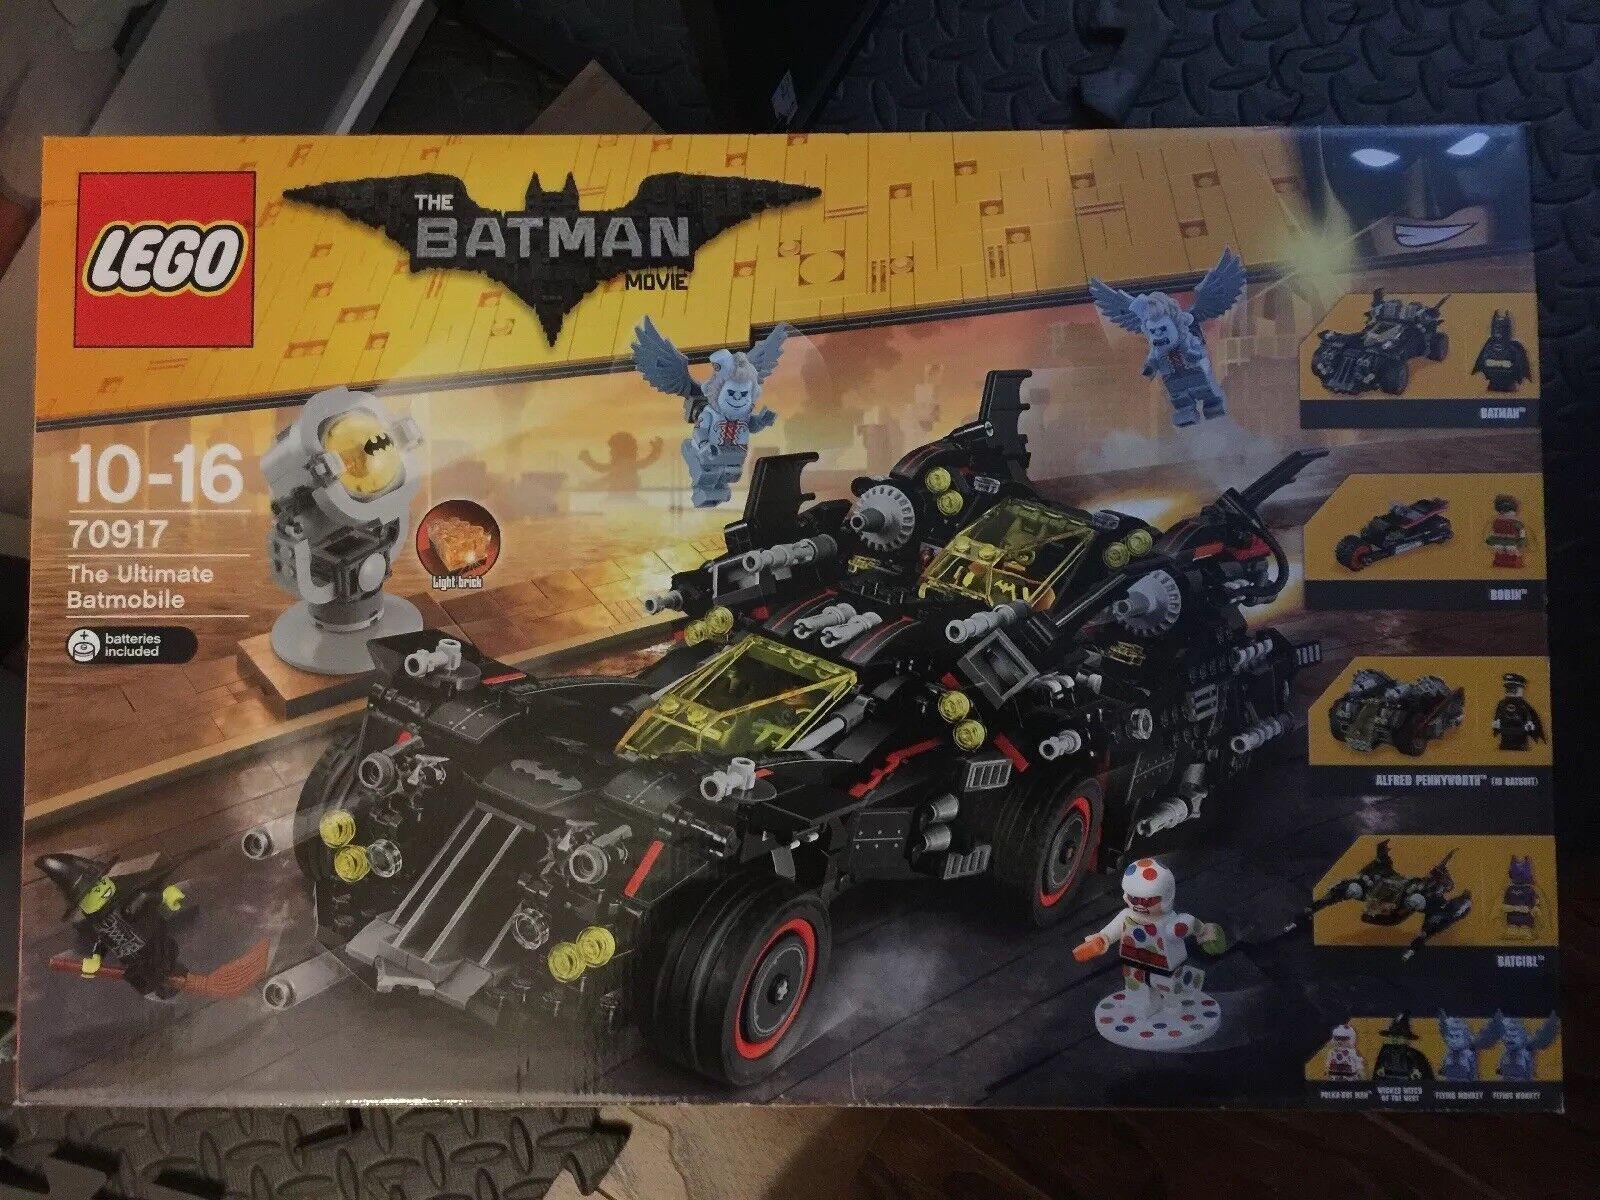 The LEGO Batman Movie The Ultimate Batmobile 70917 New Retired Set